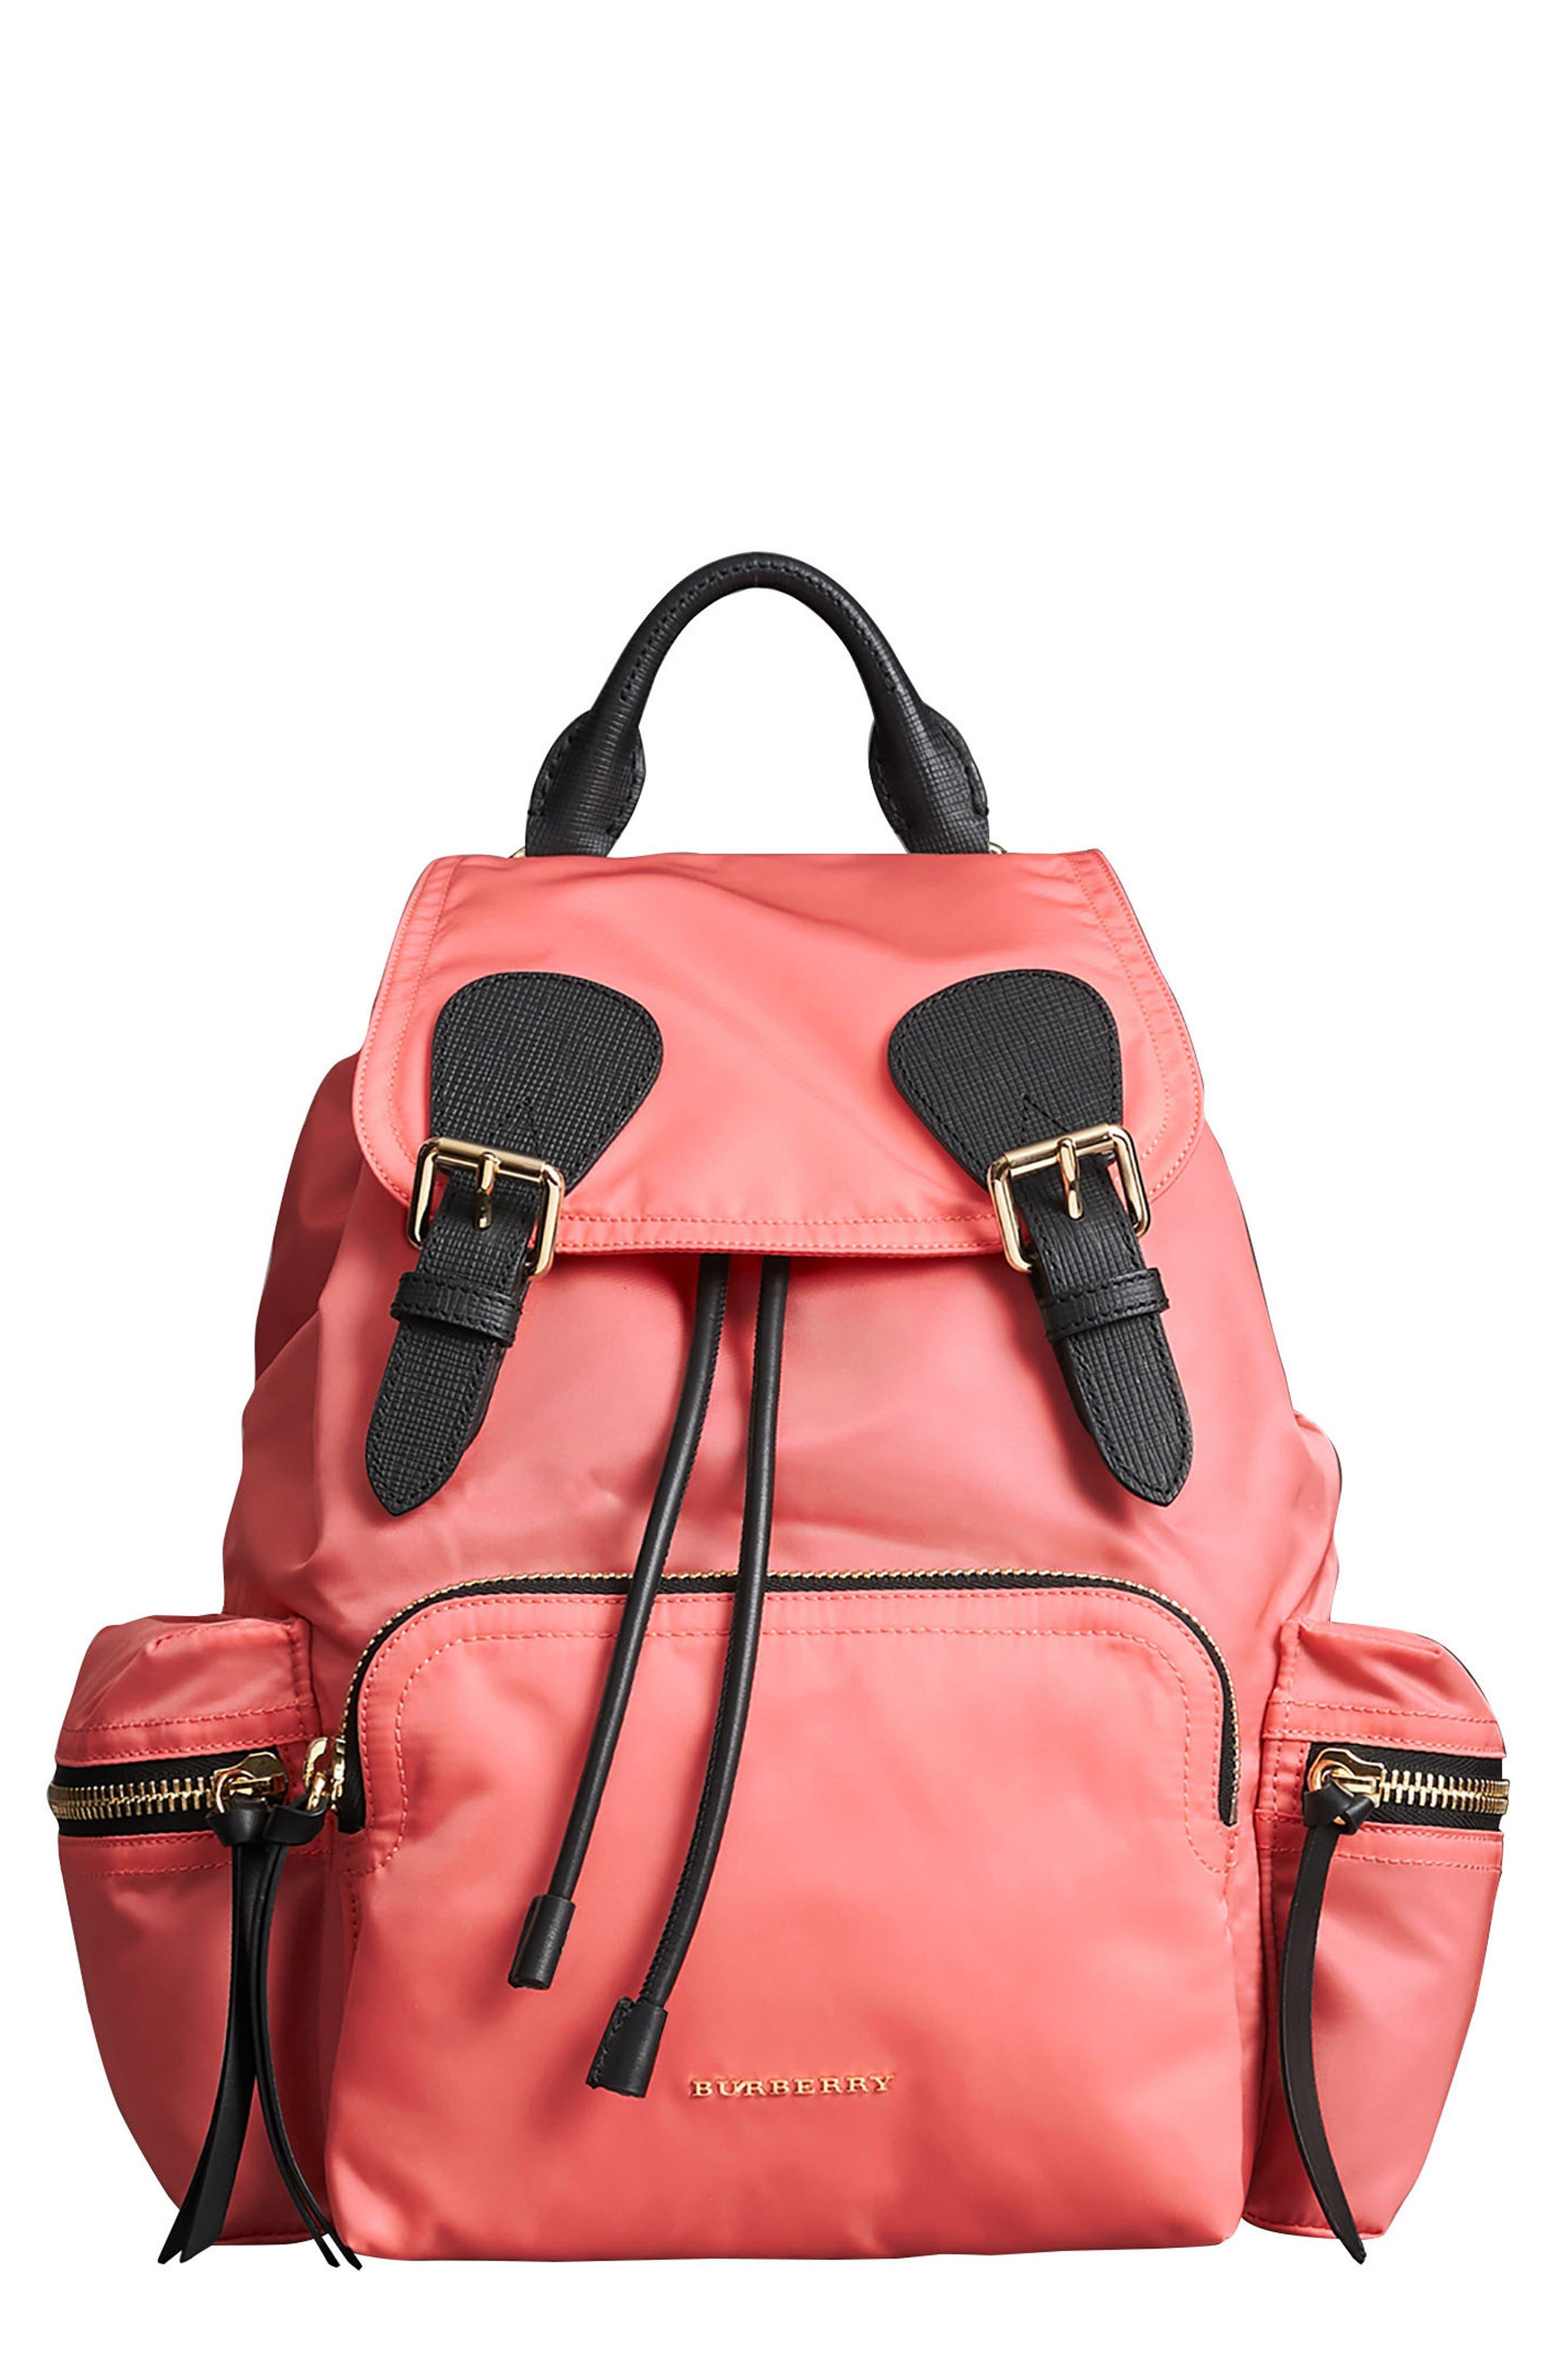 Medium Rucksack Nylon Backpack,                         Main,                         color, Bright Coral Pink